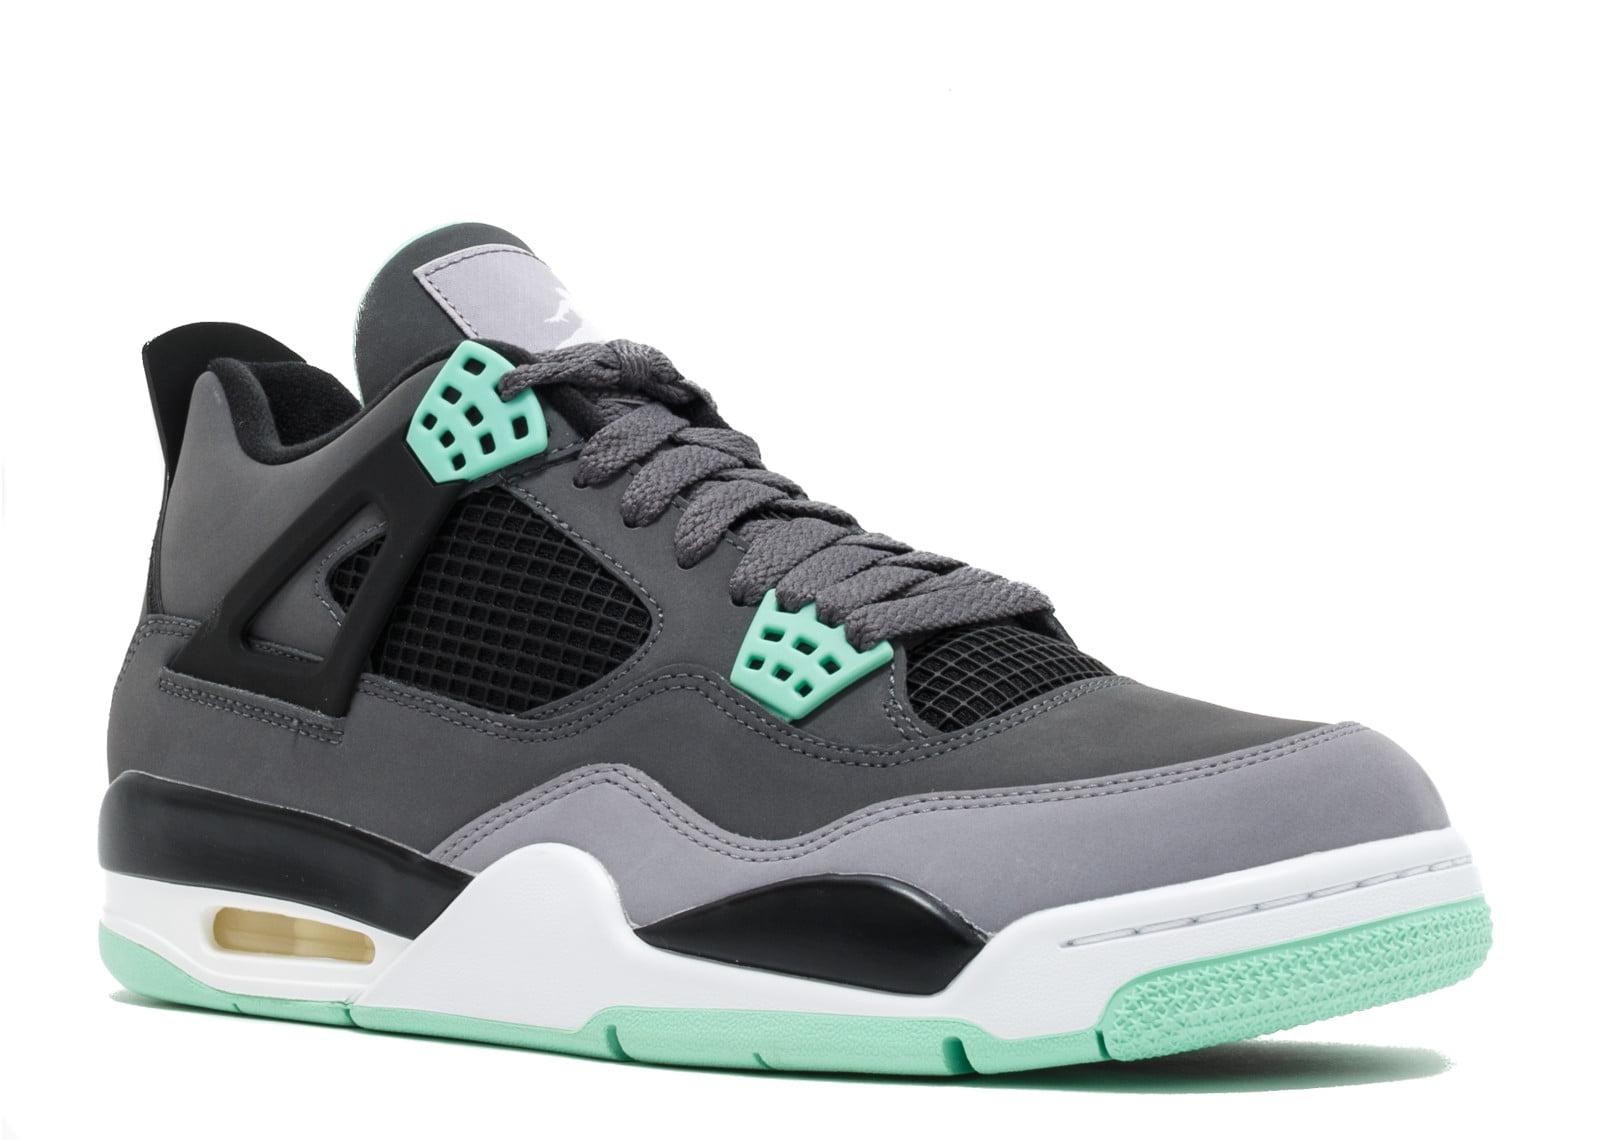 huge discount a0c7b 2dcd7 Air Jordan - Men - Air Jordan 4 Retro  Green Glow  - 308497-033 - Size 10.5